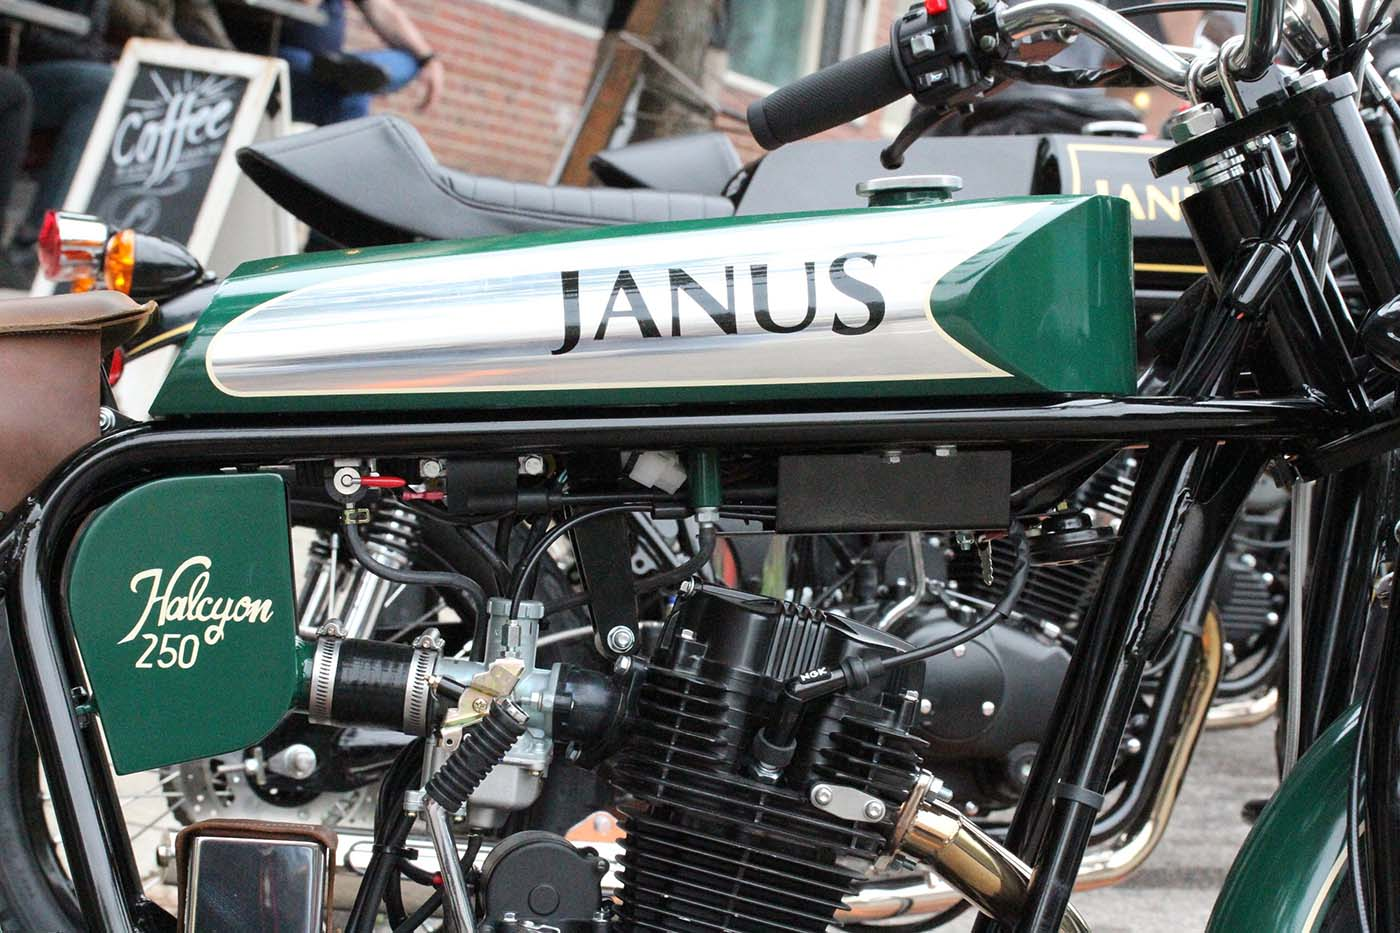 Janus Halcyon 250 Bodywork